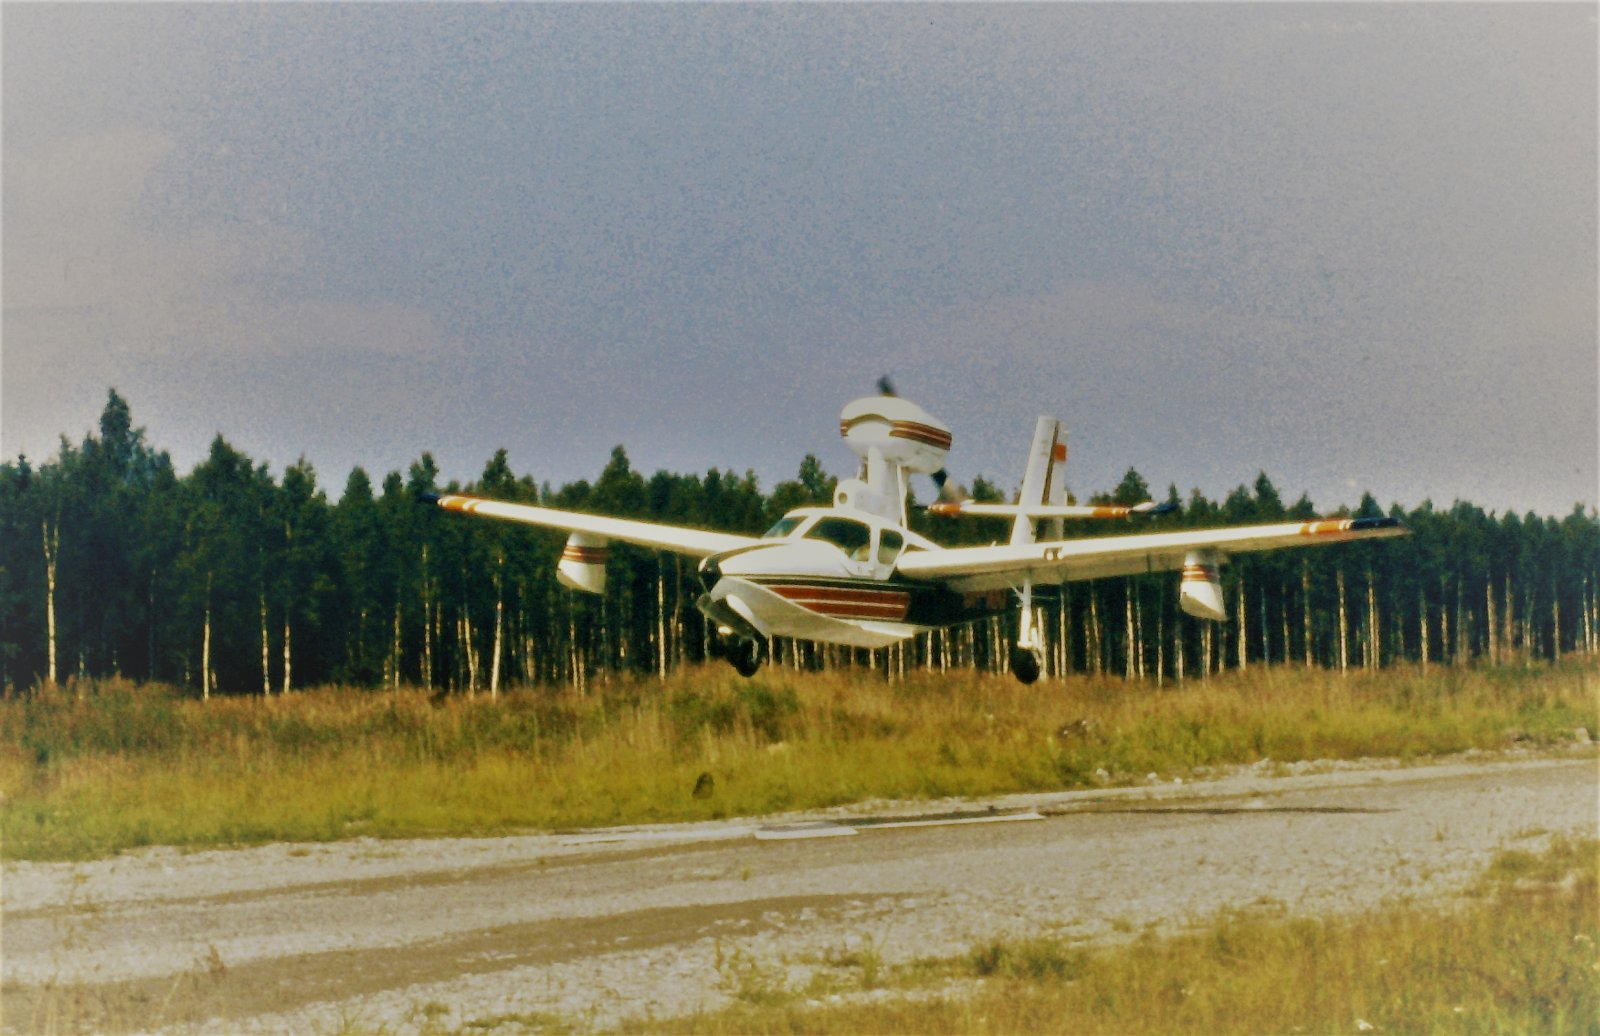 Lake LA-4-200 Buccaneer OH-AKI EFHN 1980